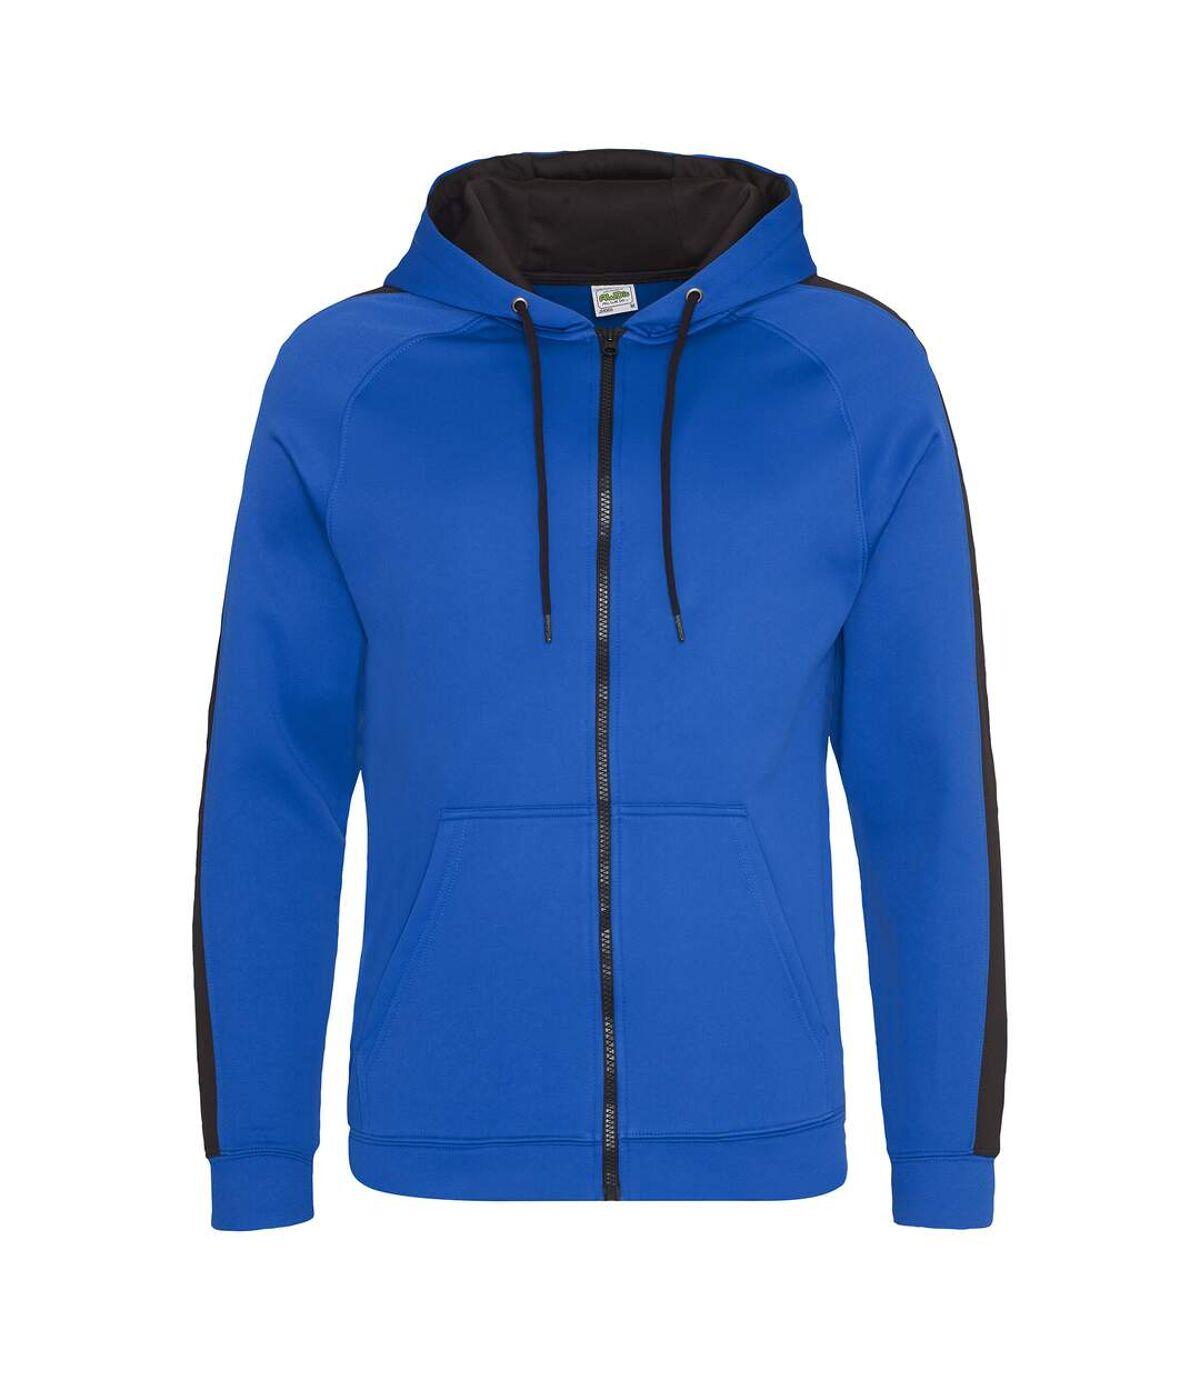 AWDis Just Hoods Mens Contrast Sports Polyester Full Zip Hoodie (Royal Blue/Jet Black) - UTPC2967